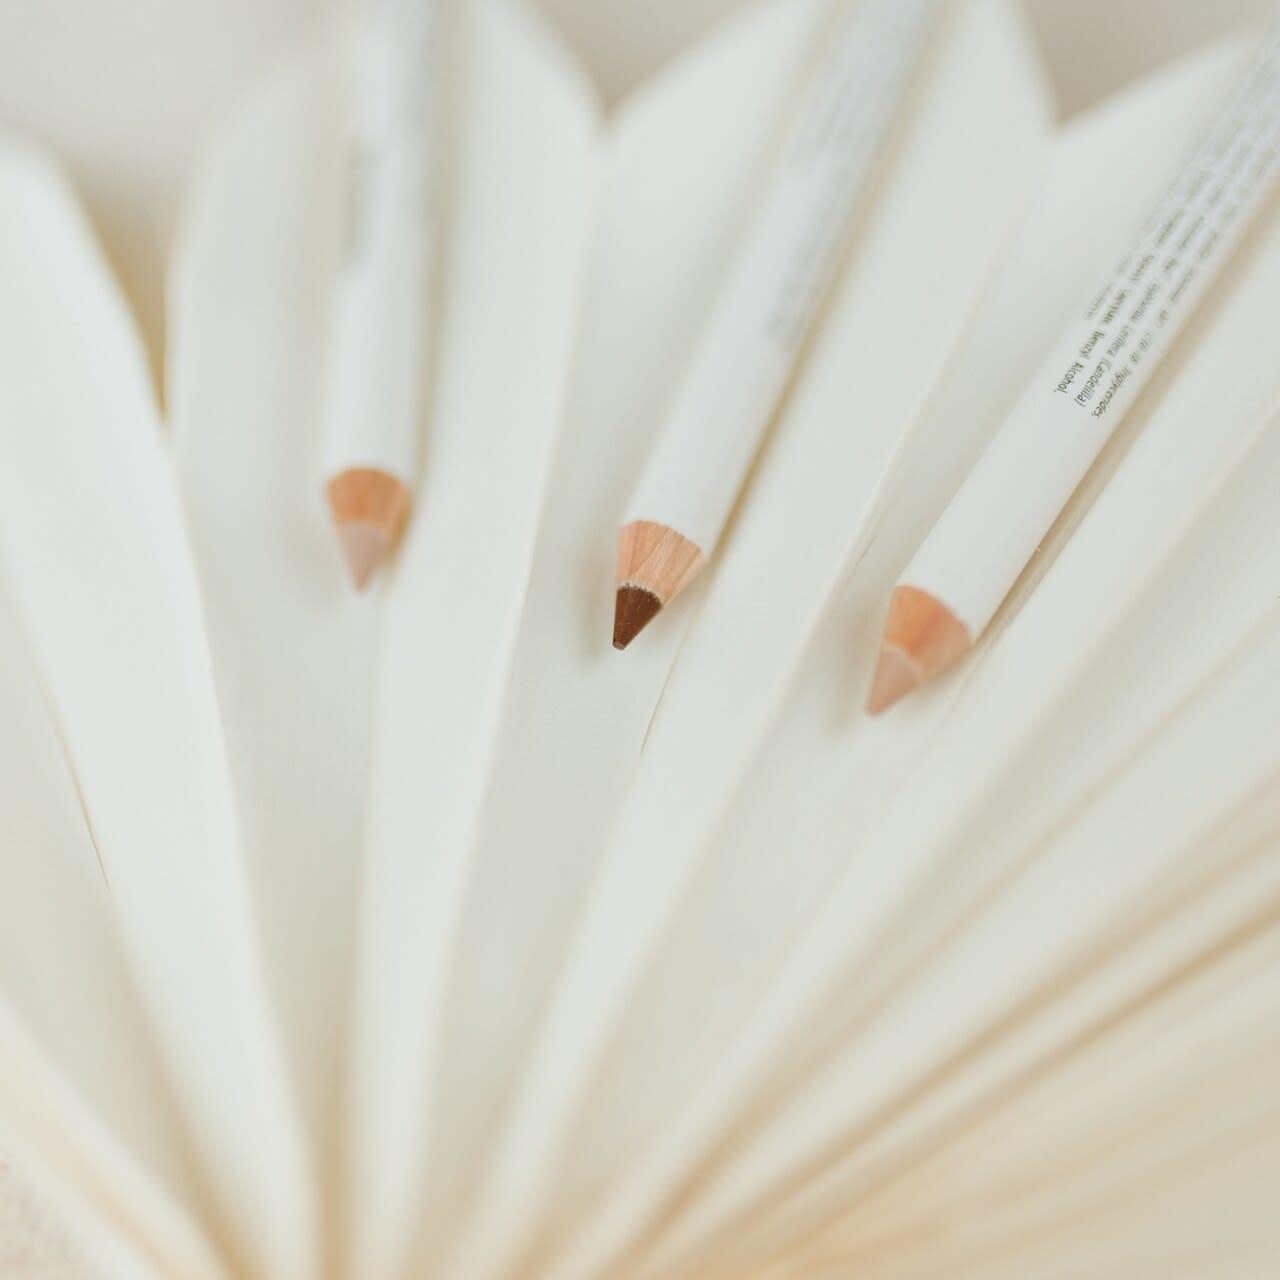 Eyebrow Pencil - Brunette-3